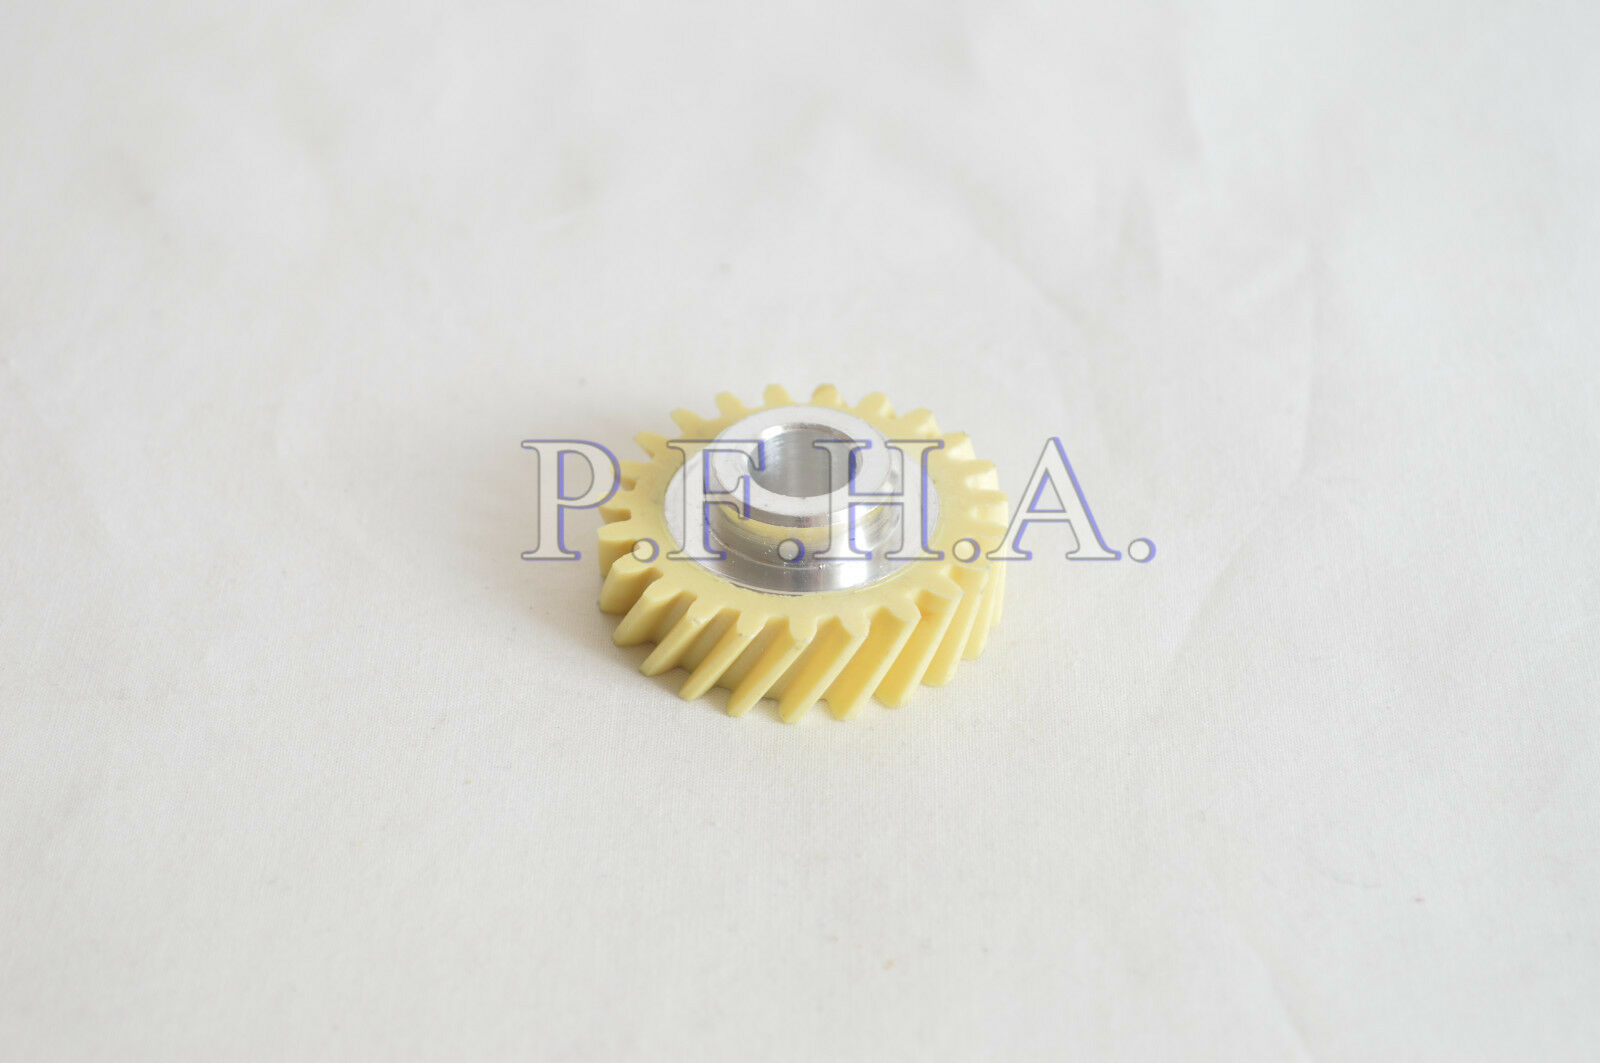 WPW10112253 KitchenAid Mélangeur Worm Drive Gear